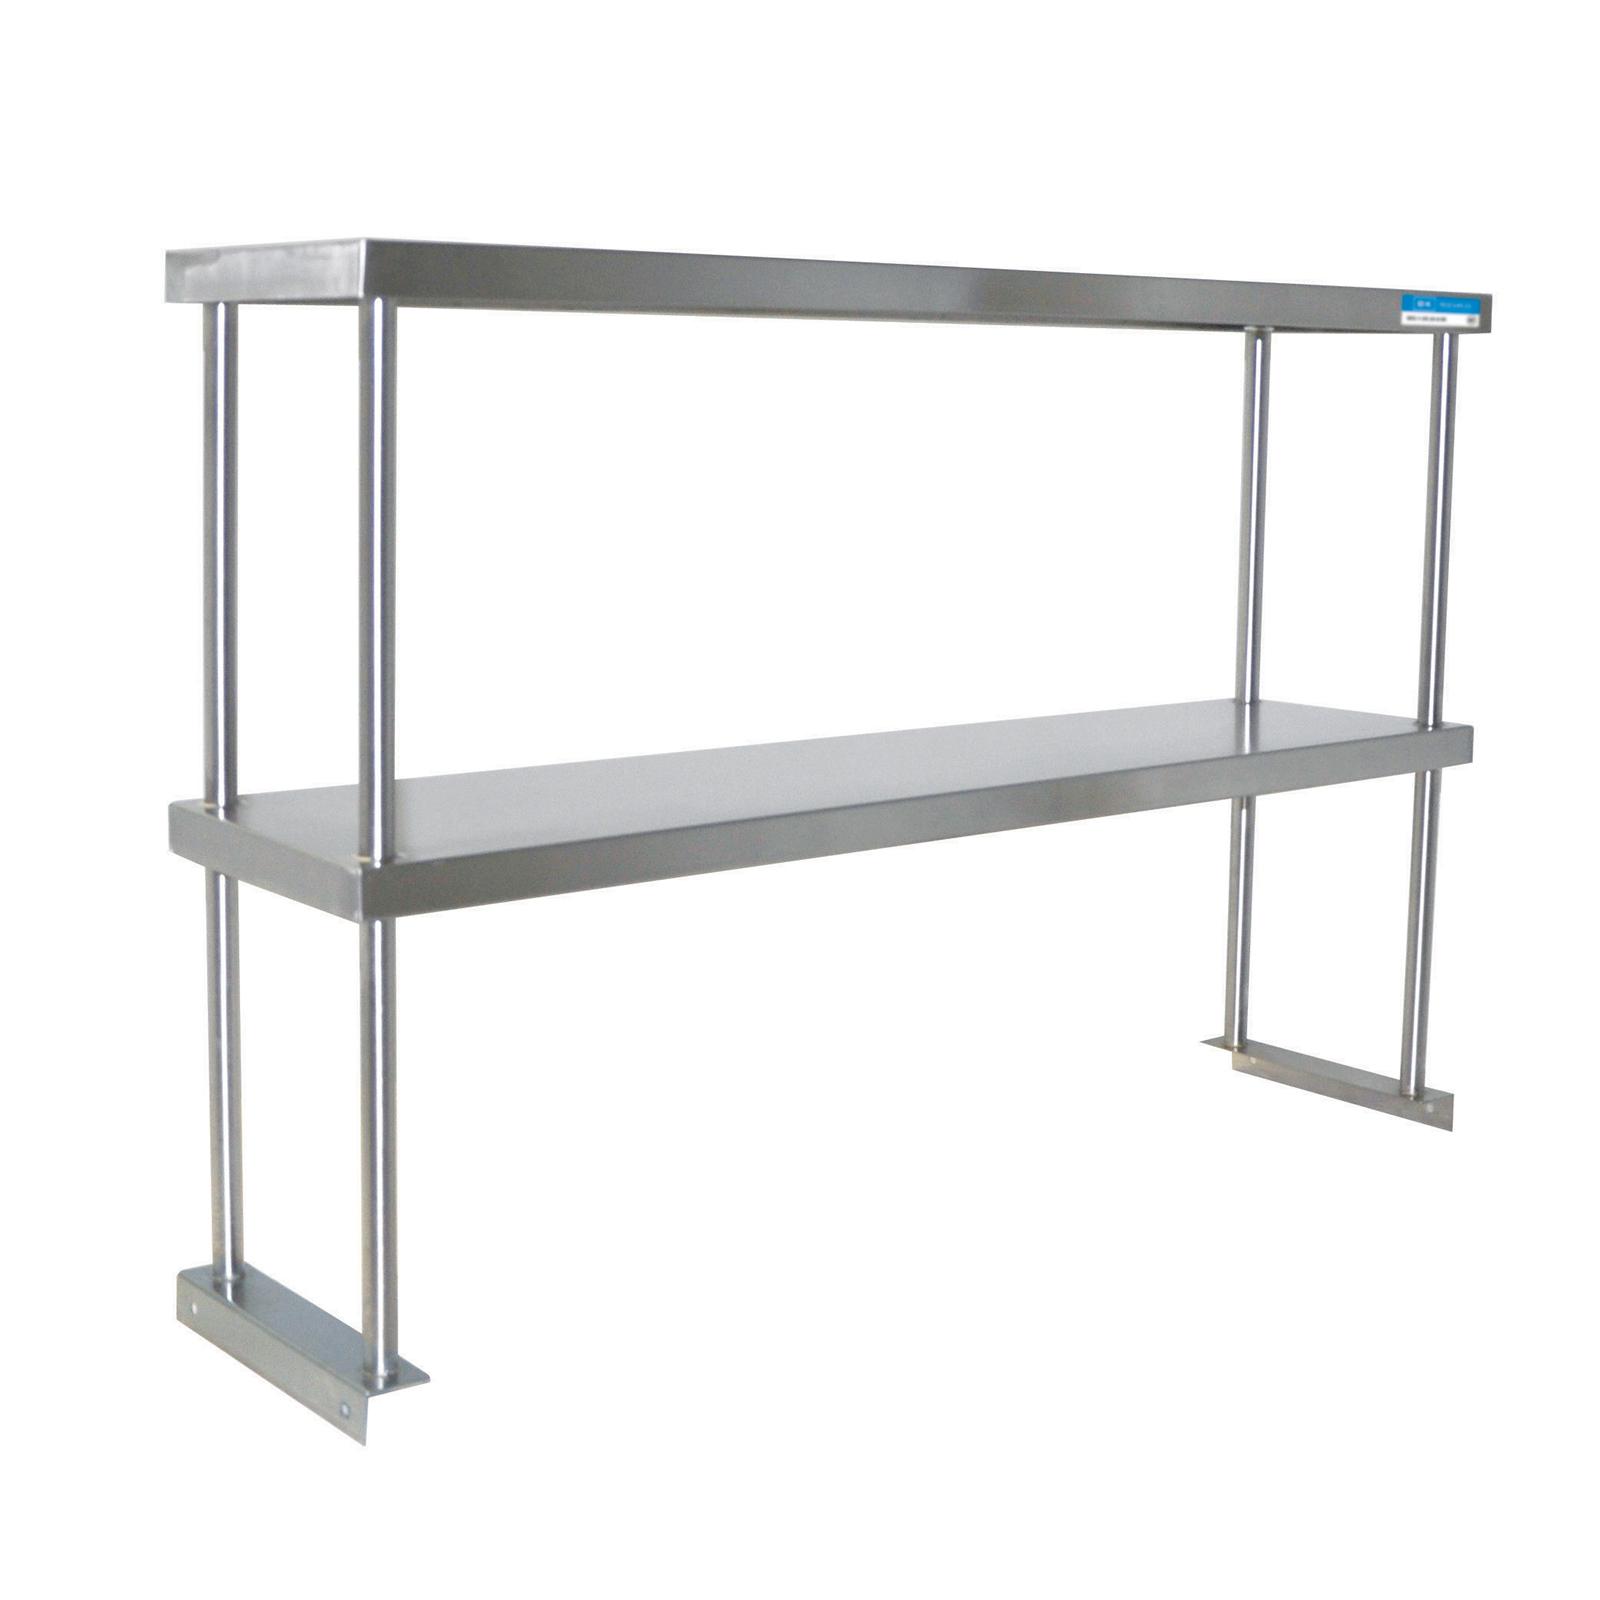 BK Resources BK-OSD-1872 overshelf, table-mounted